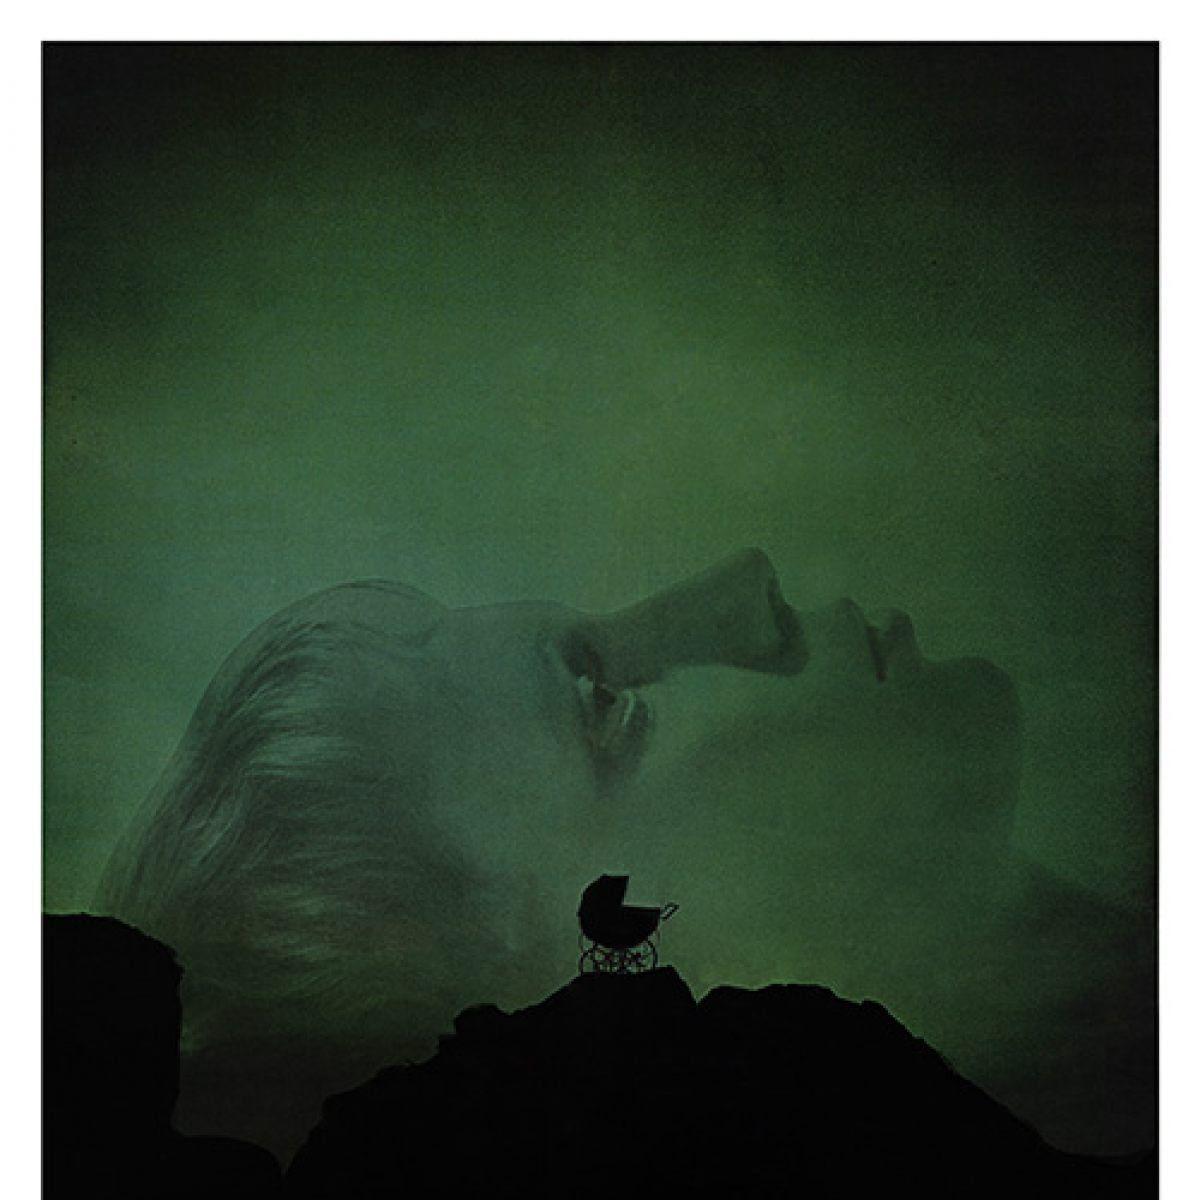 Rosemarys-Baby-Poster_1200_1855_81_s